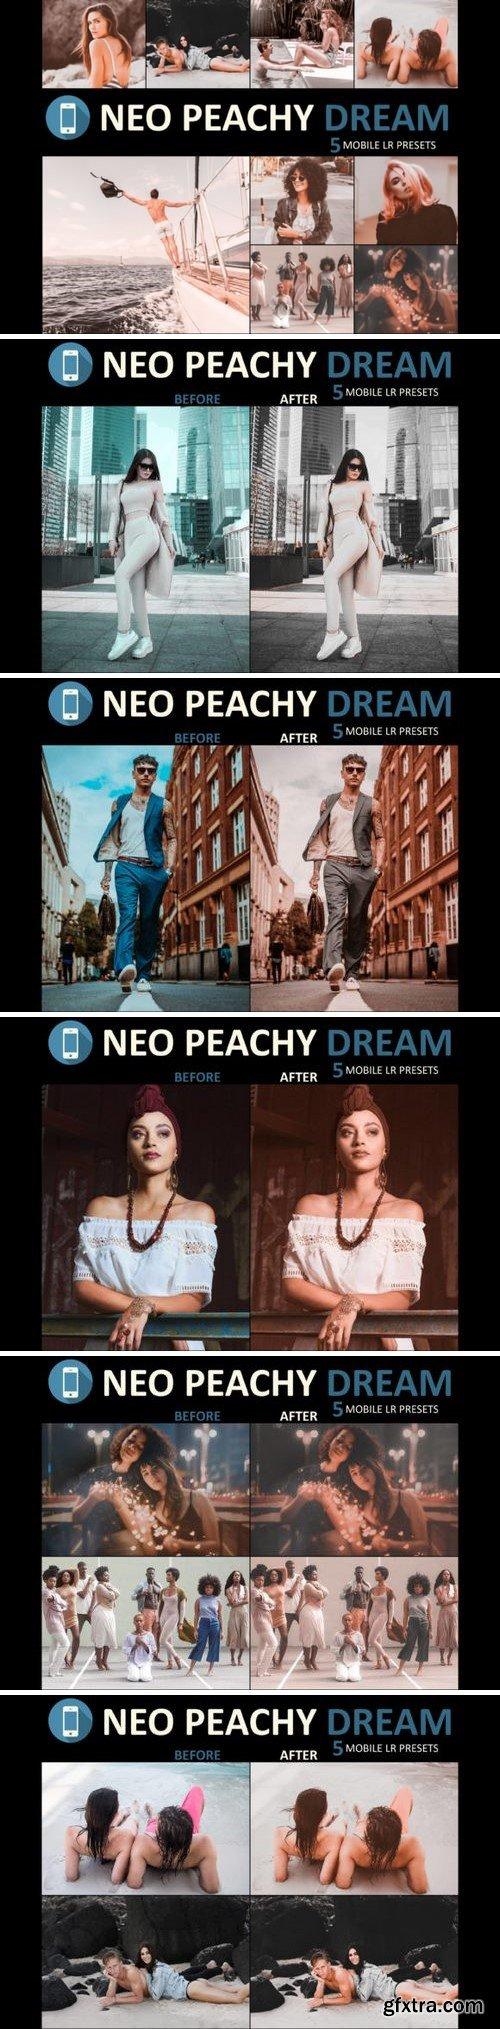 Neo Peachy Dream mobile lightroom presets